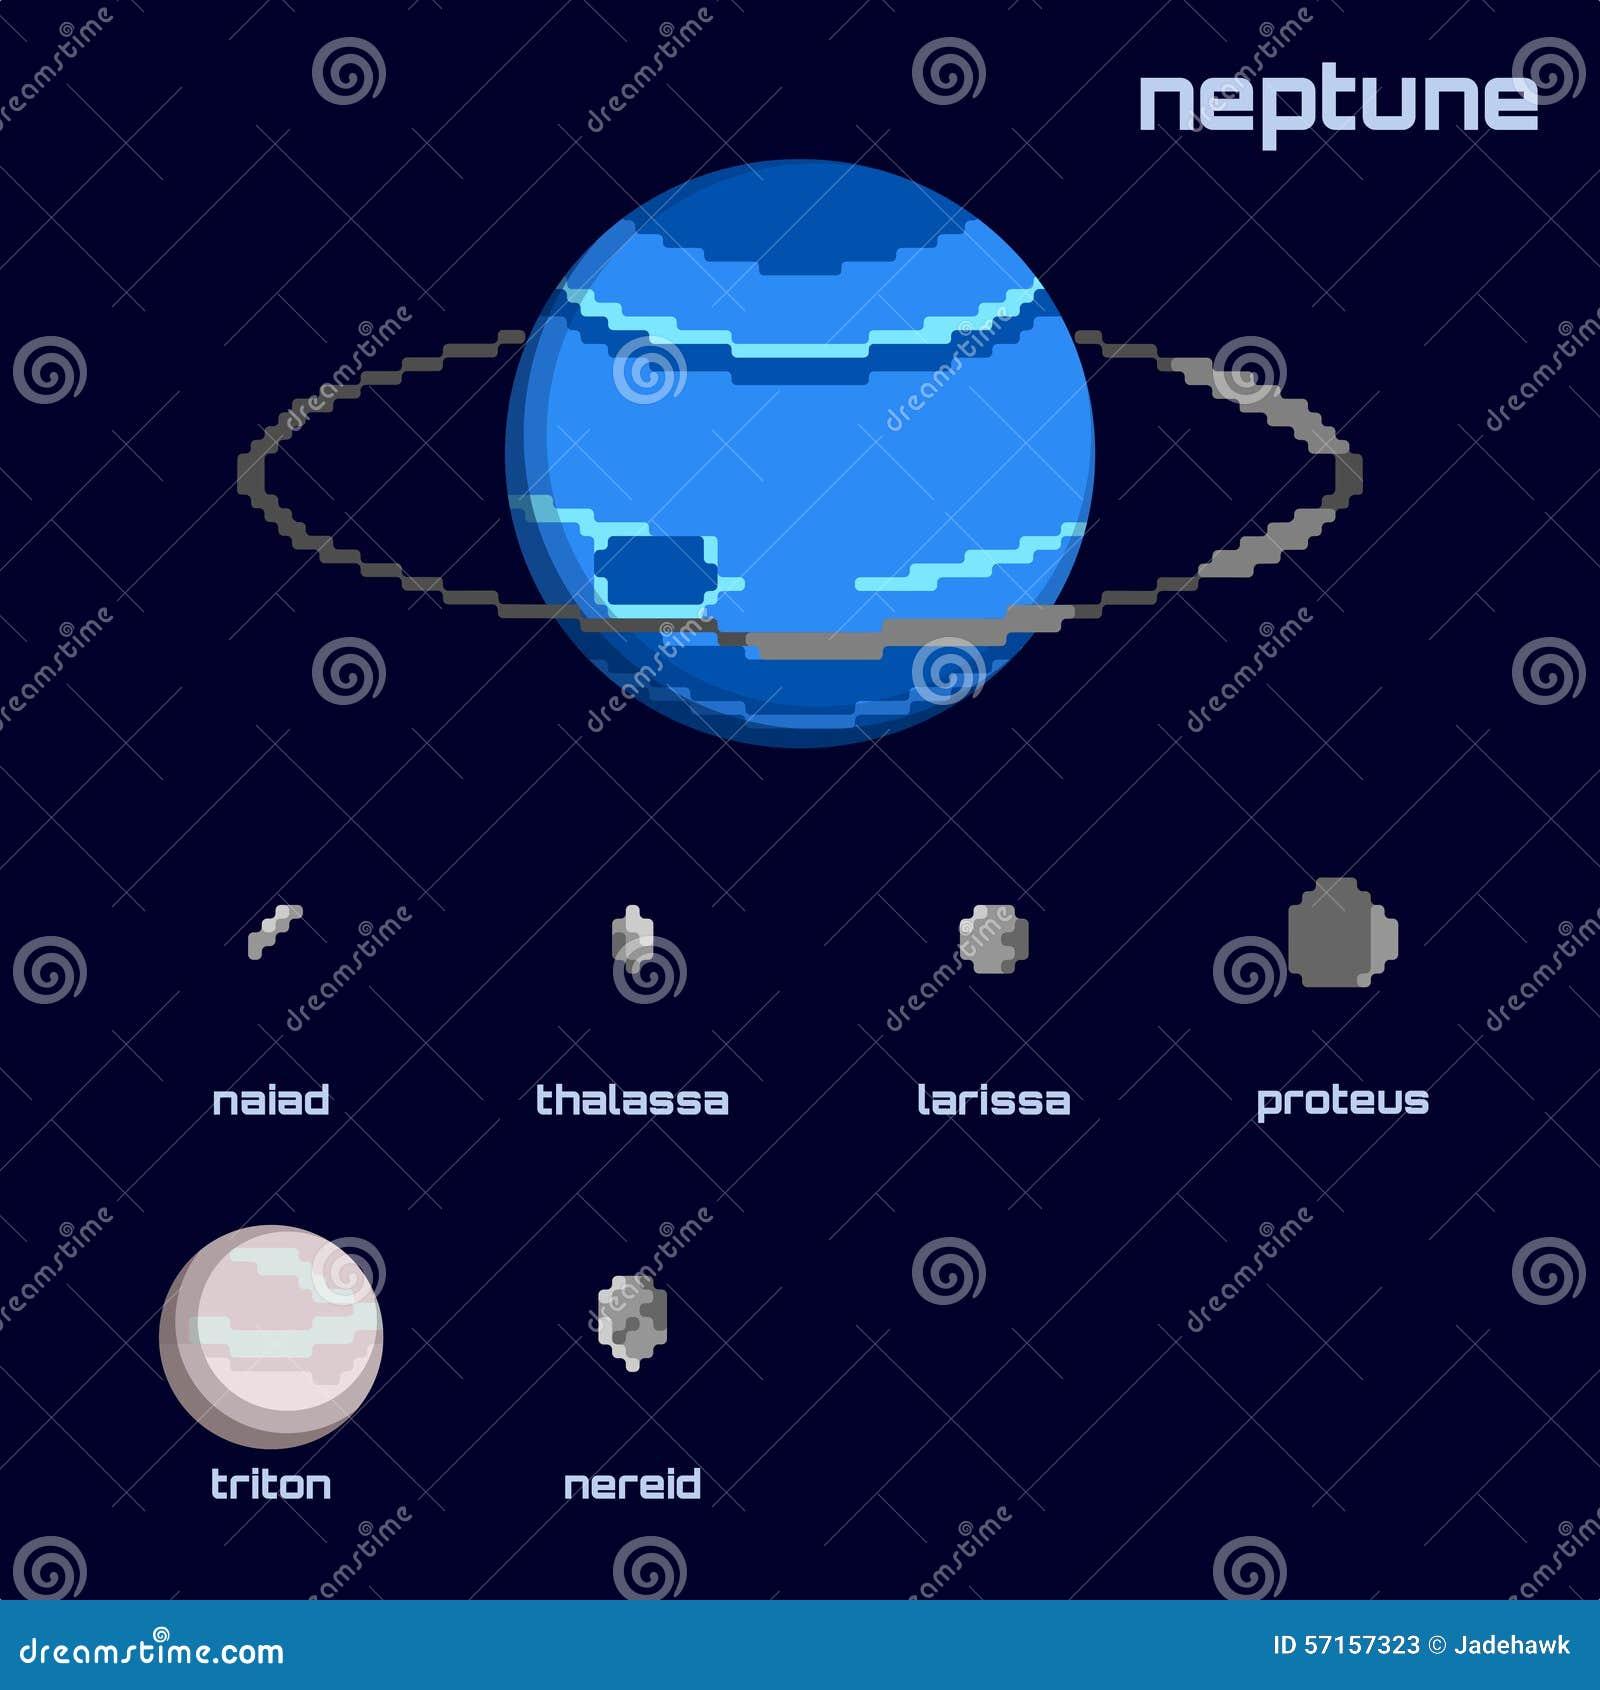 Retro Minimalistic Satz Neptun Und Monde Vektor Abbildung